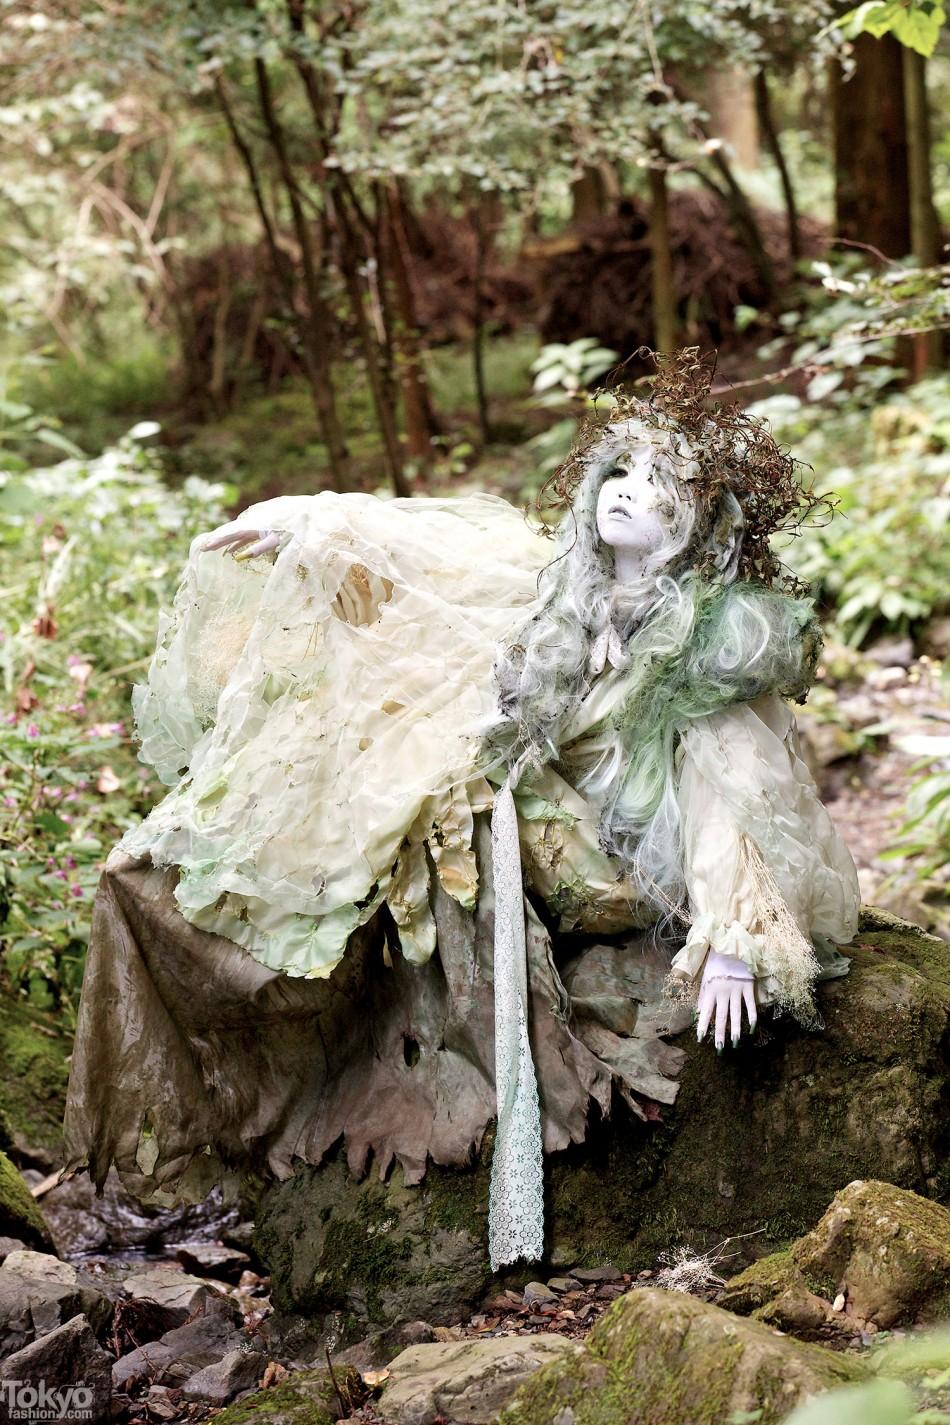 Minori - Her Memories of a Dream (21)